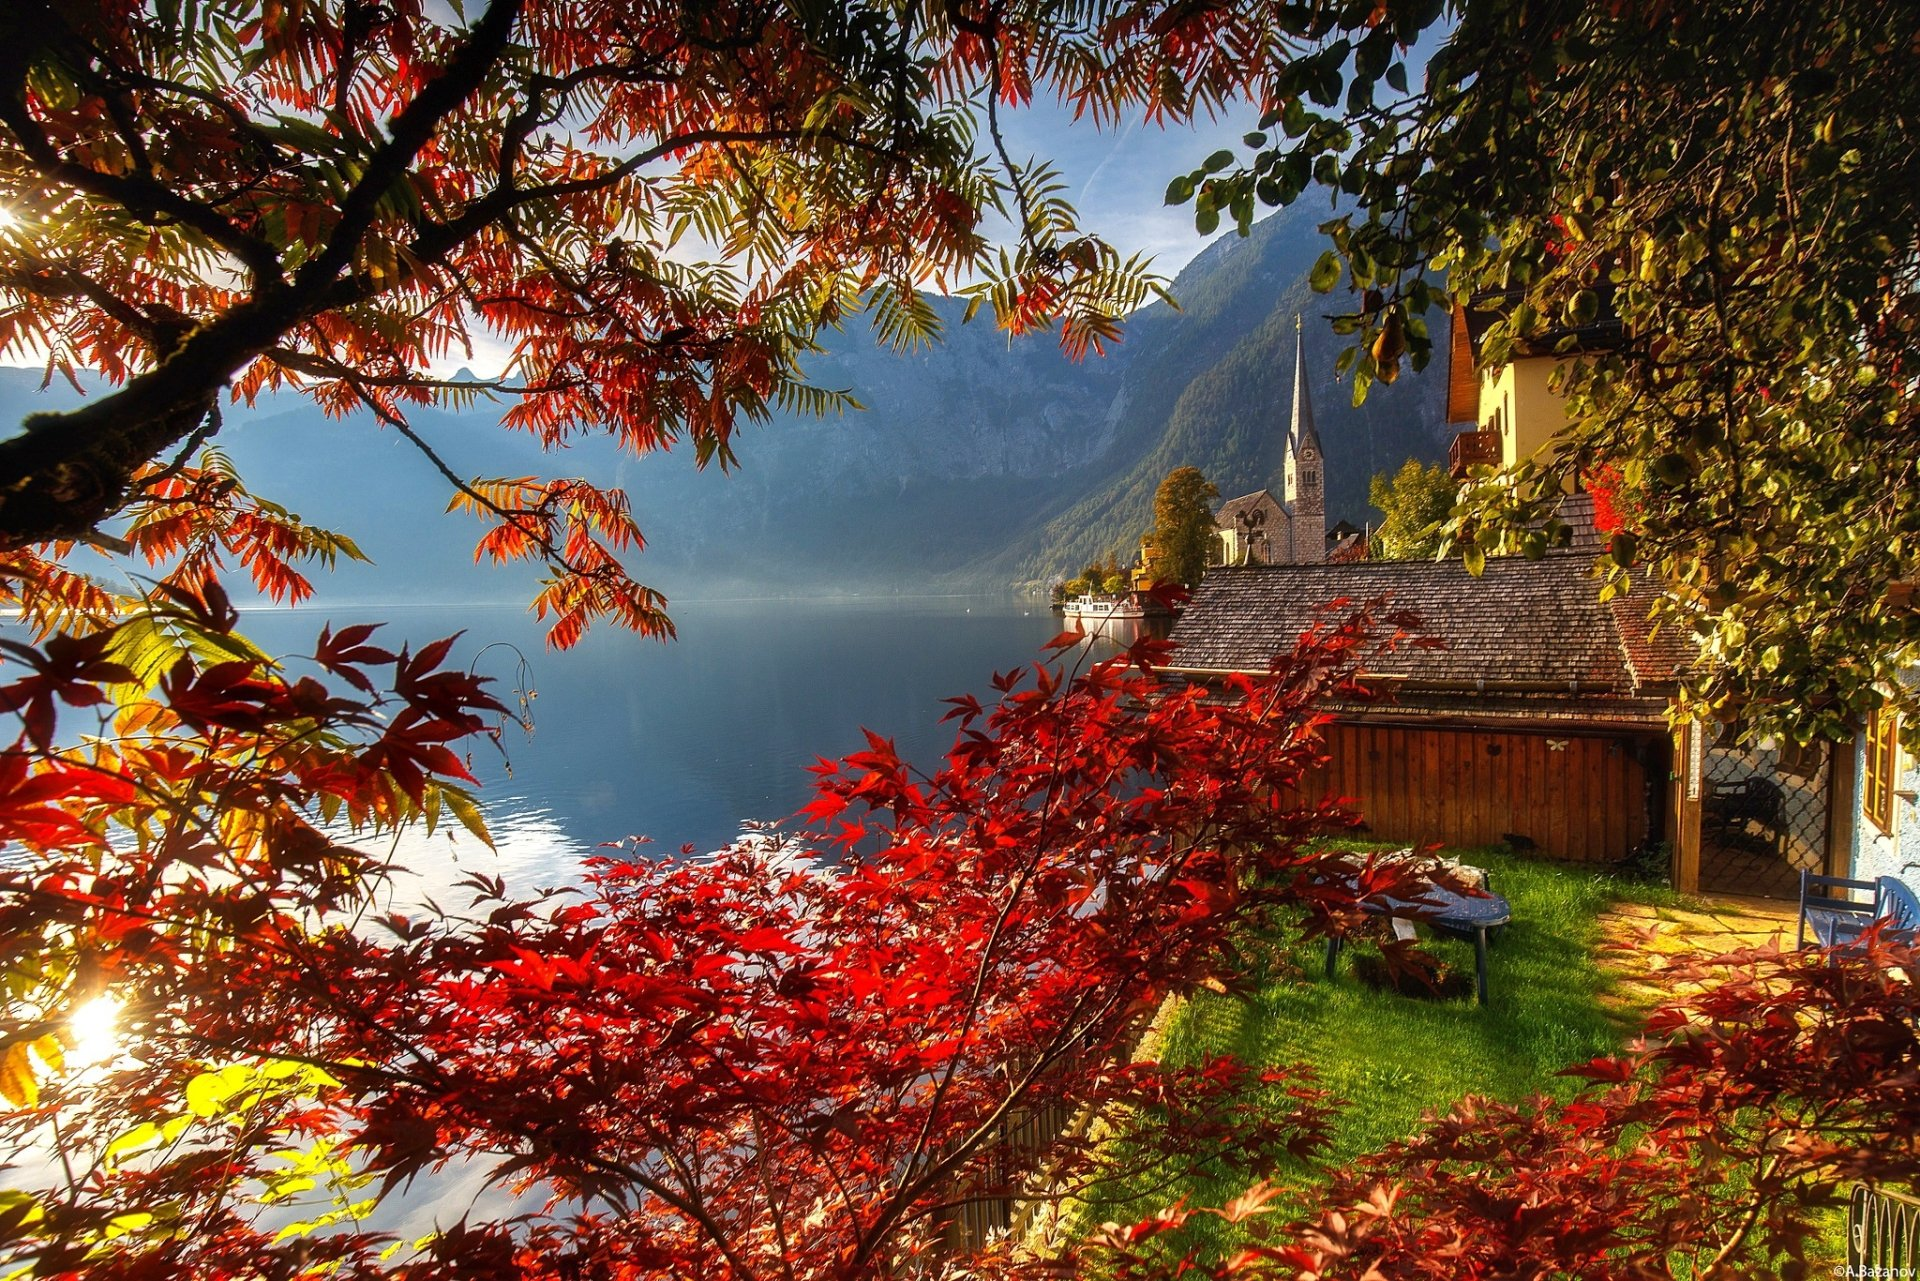 Fall Leaves Desktop Wallpaper Backgrouns Autumn In Hallstatt Austria Hd Wallpaper Background